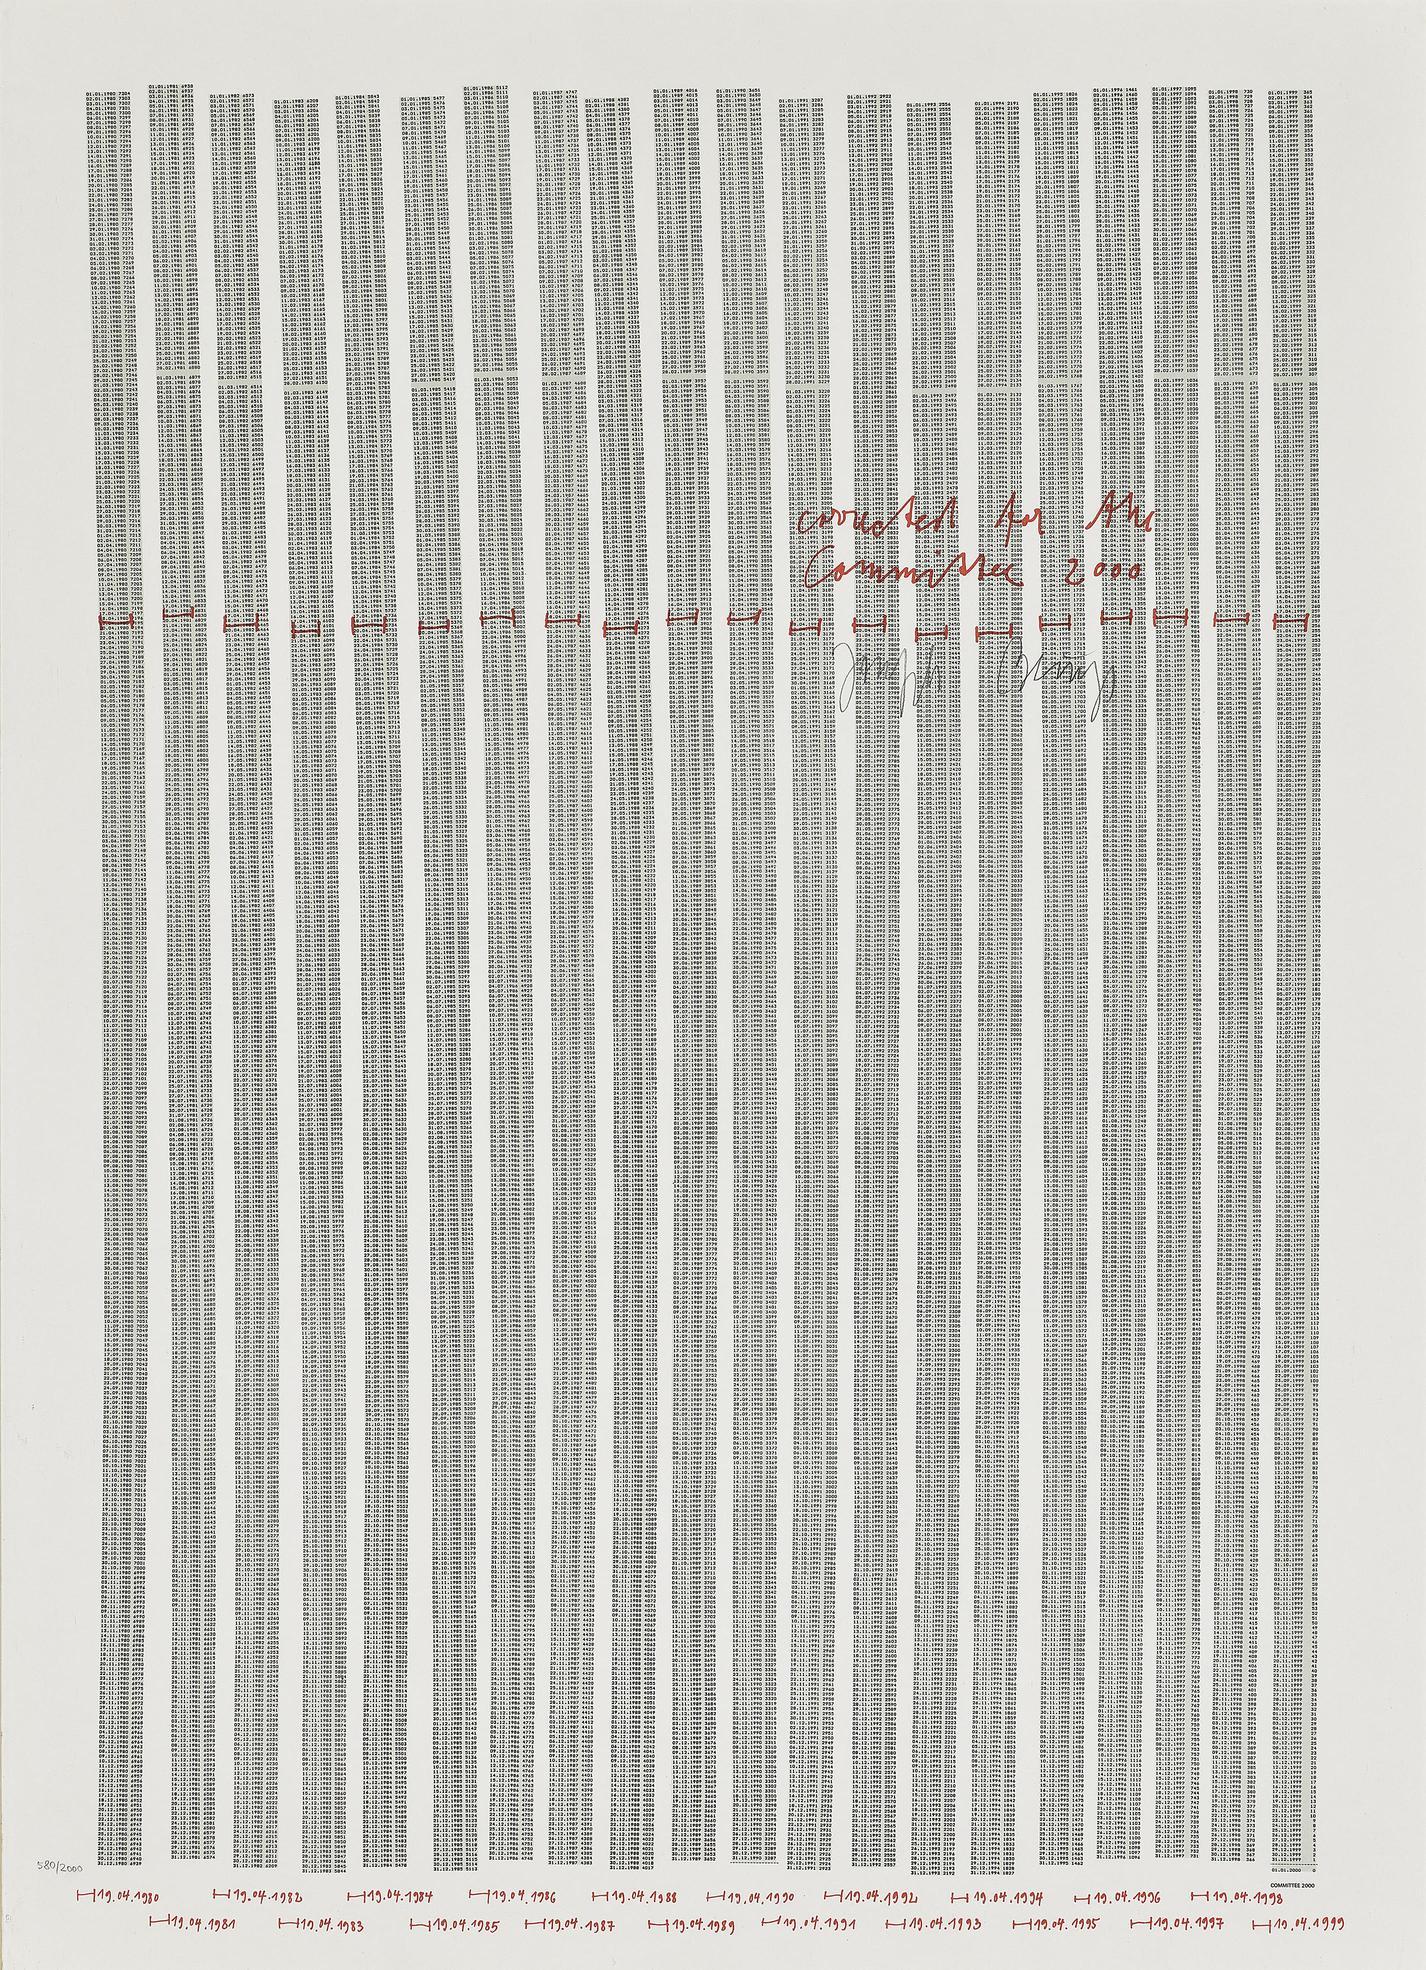 Joseph Beuys-Countdown 2000-1981